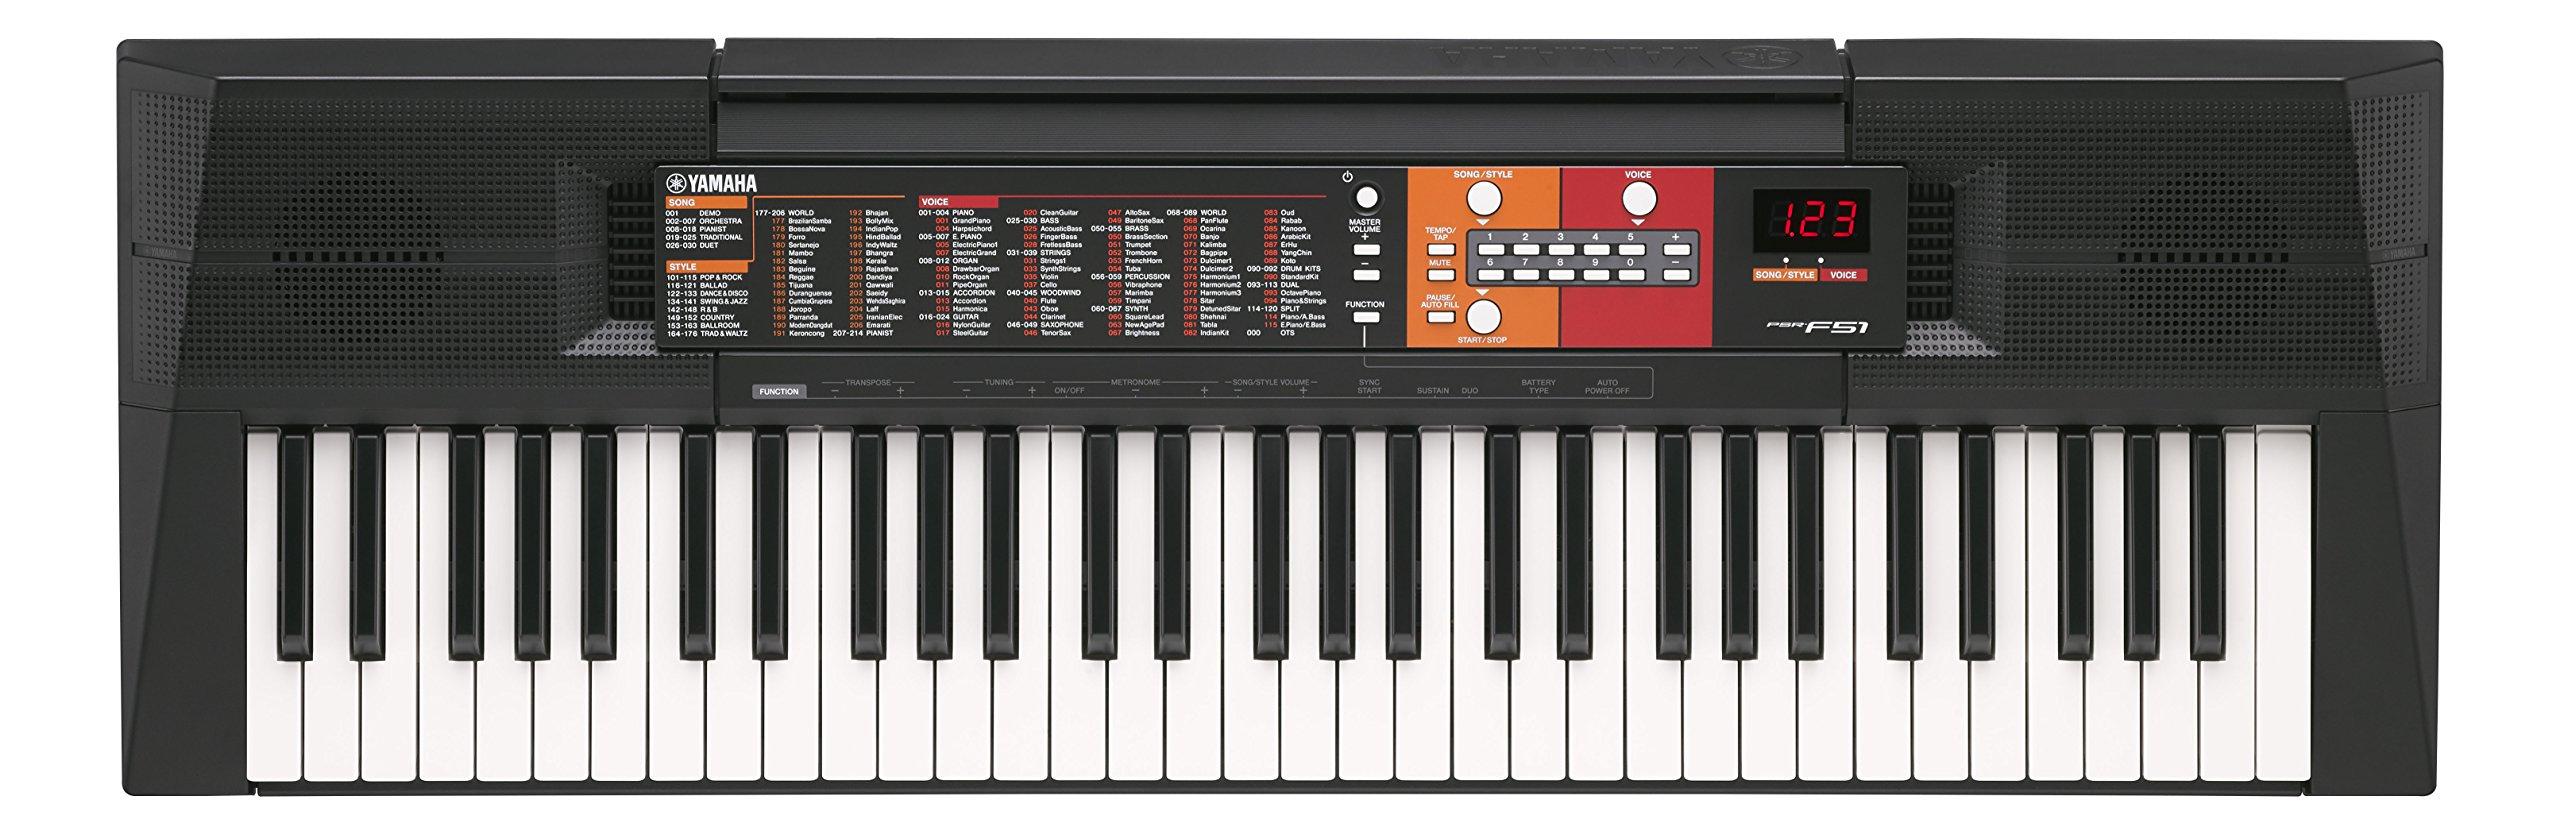 Yamaha PSRF51 61-Key Portable Keyboard, Base Model